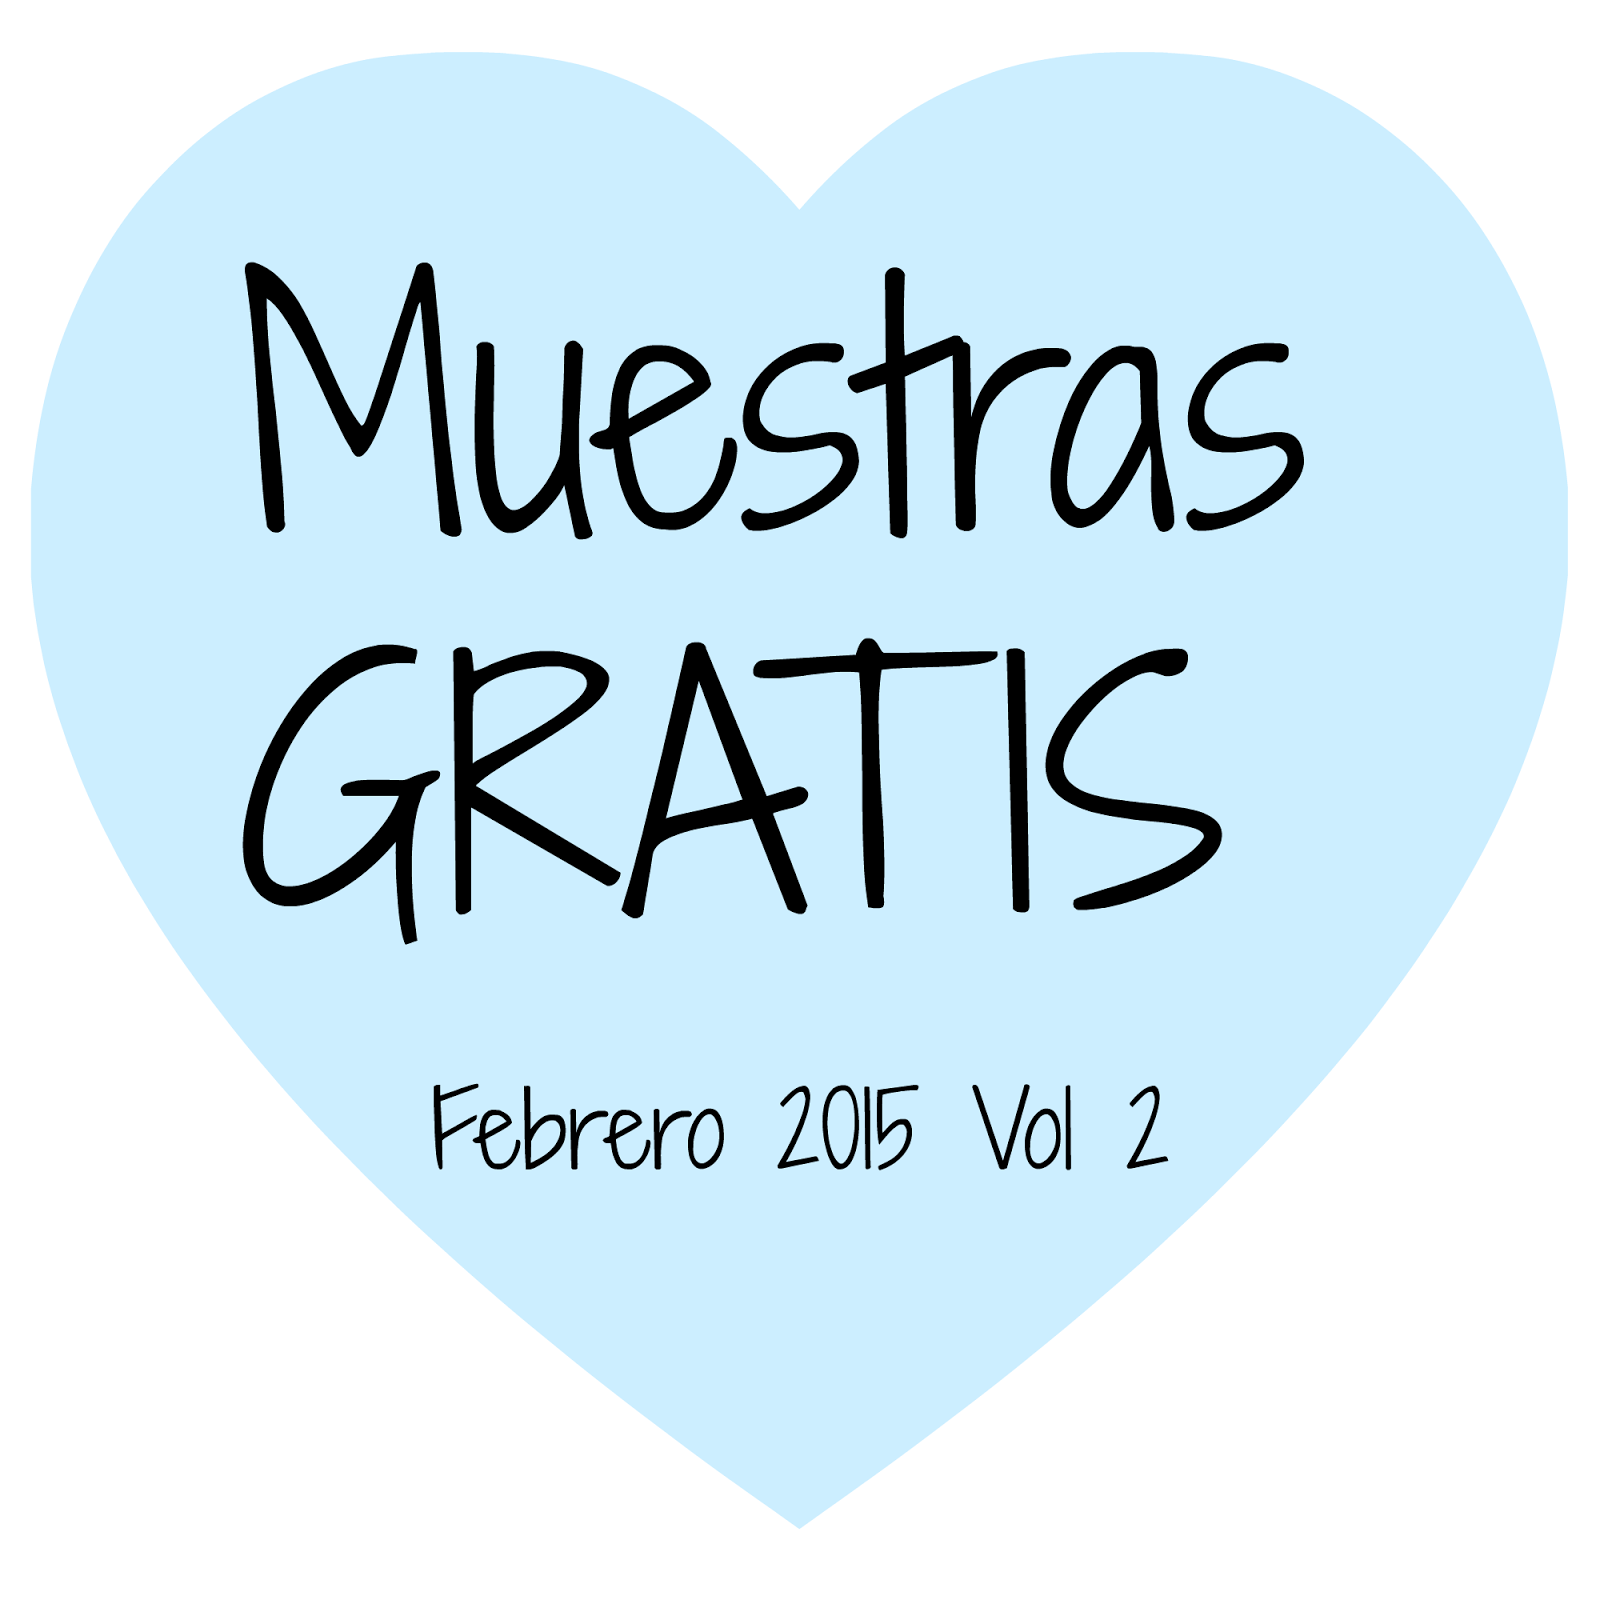 Muestras gratis febrero 2